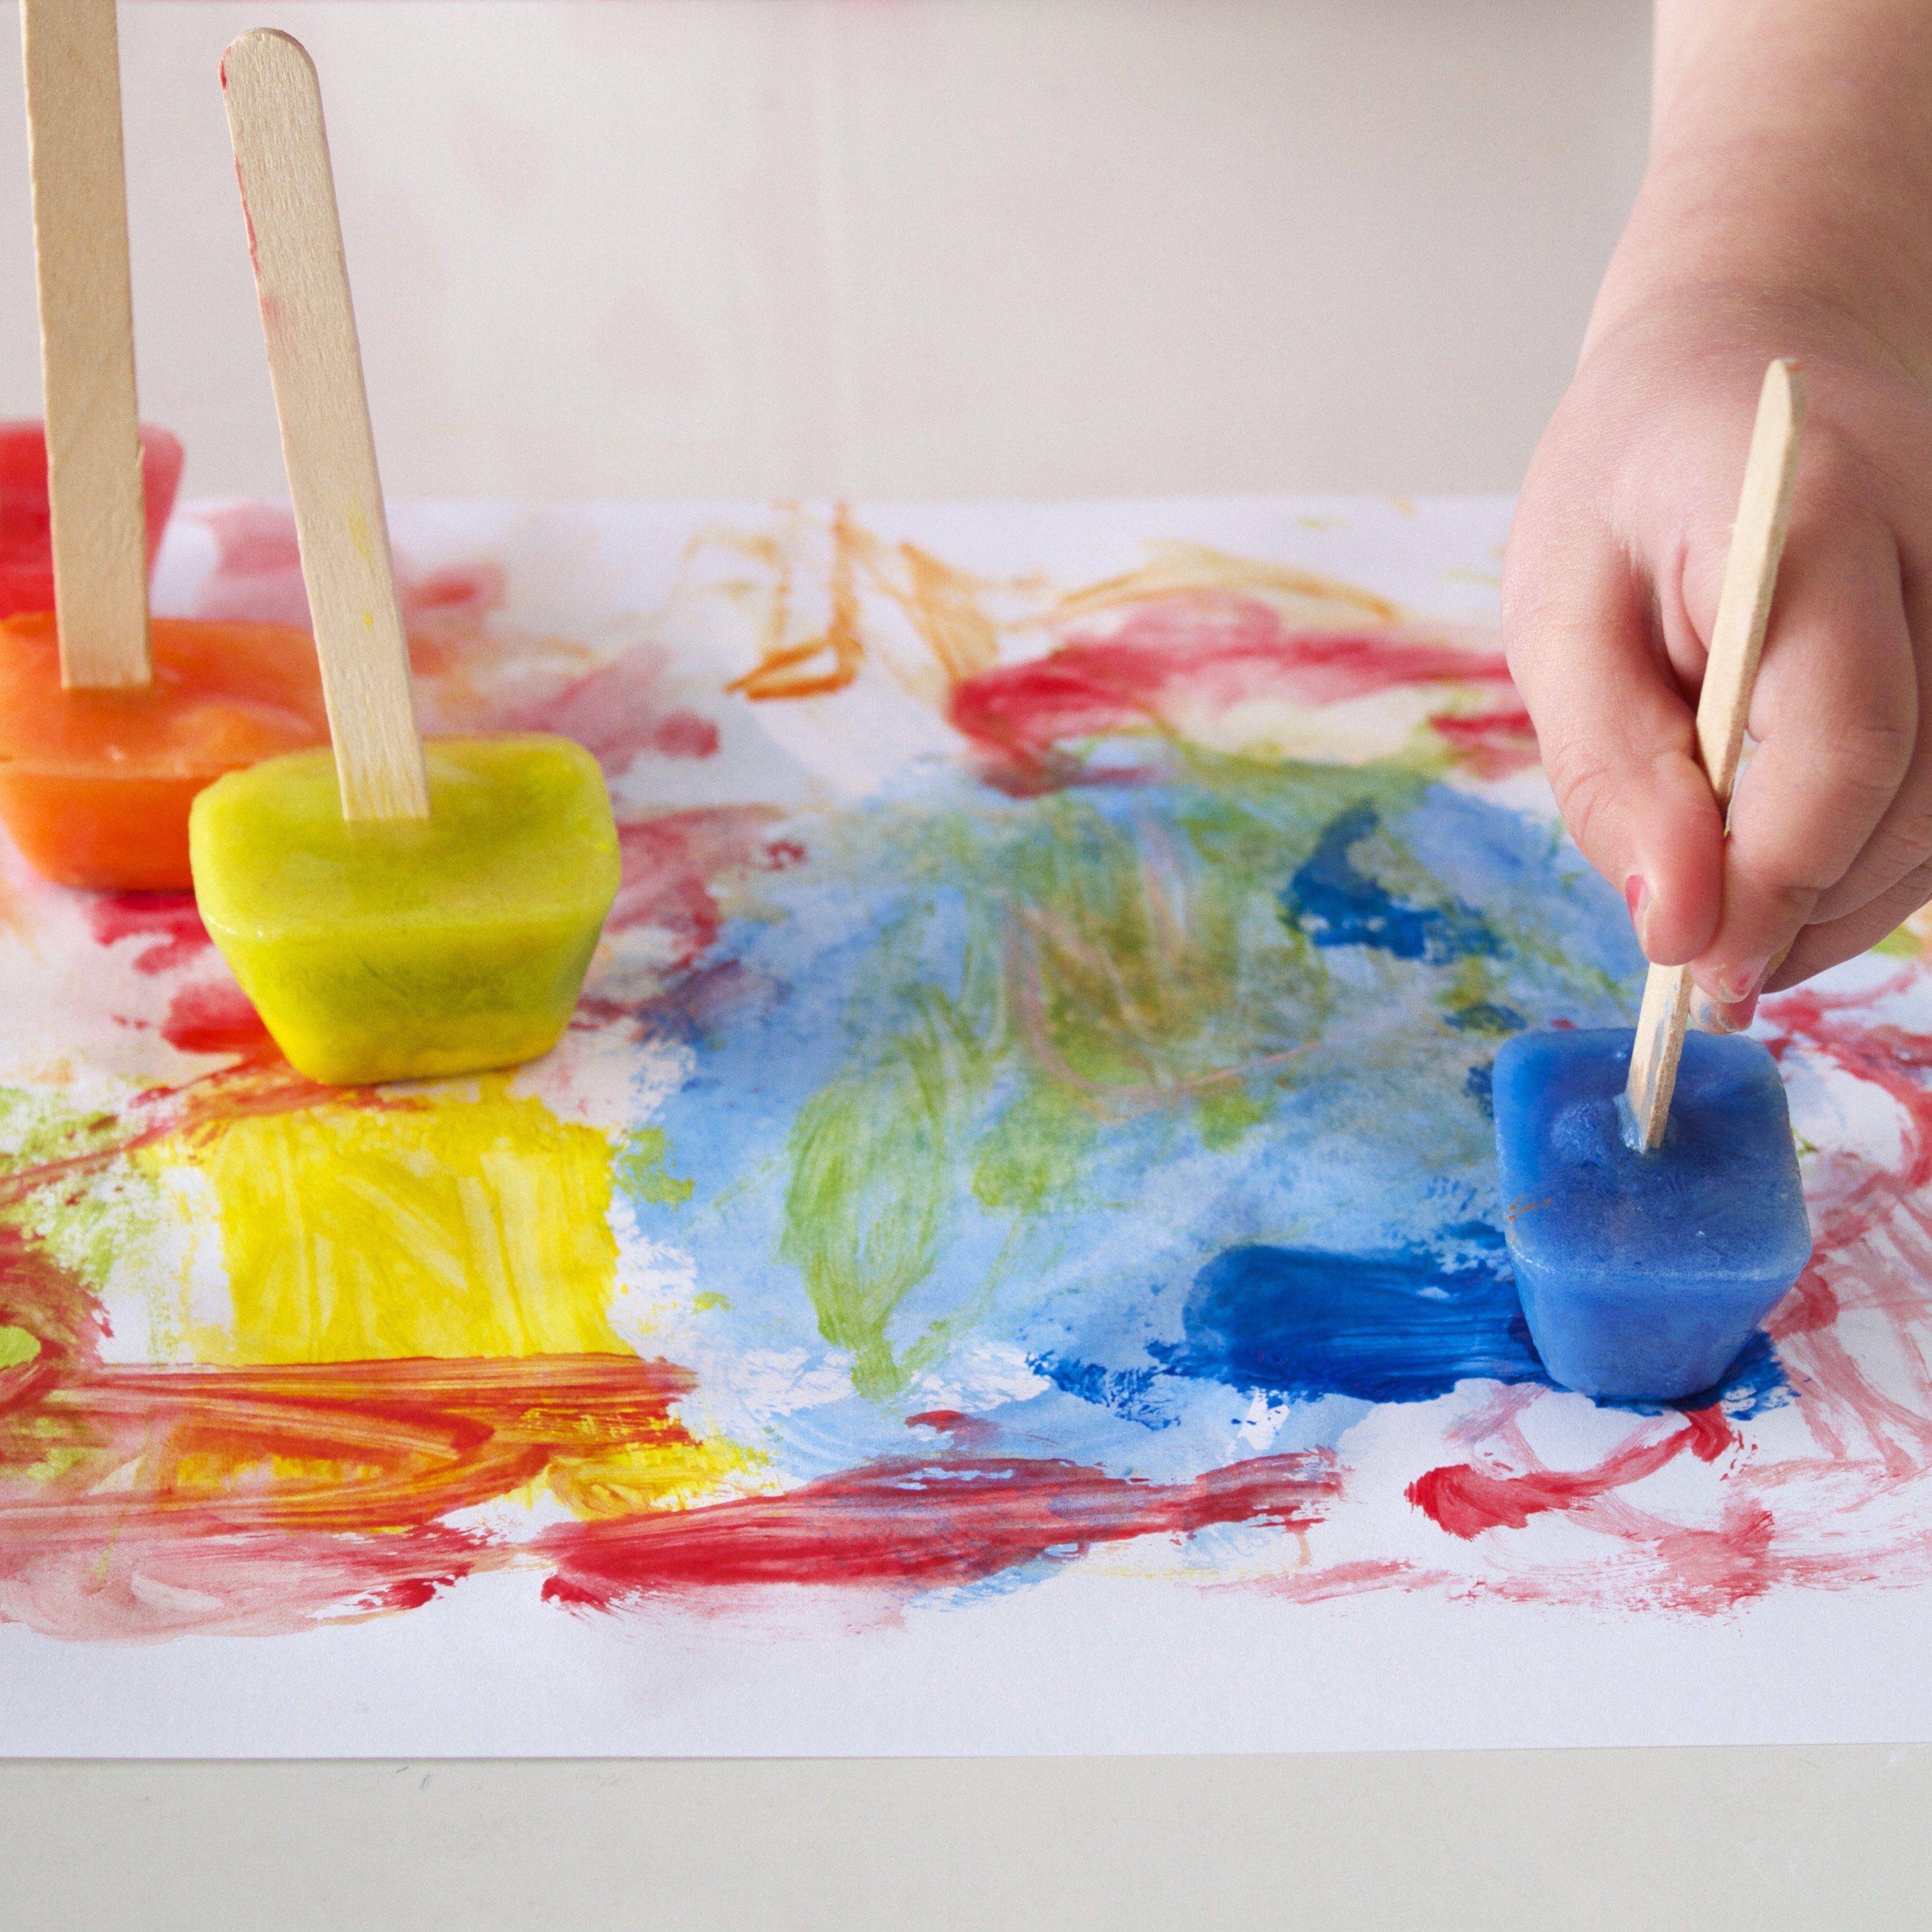 Ice cube painting kids crafts activities pinterest - Angebote kindergarten sommer ...